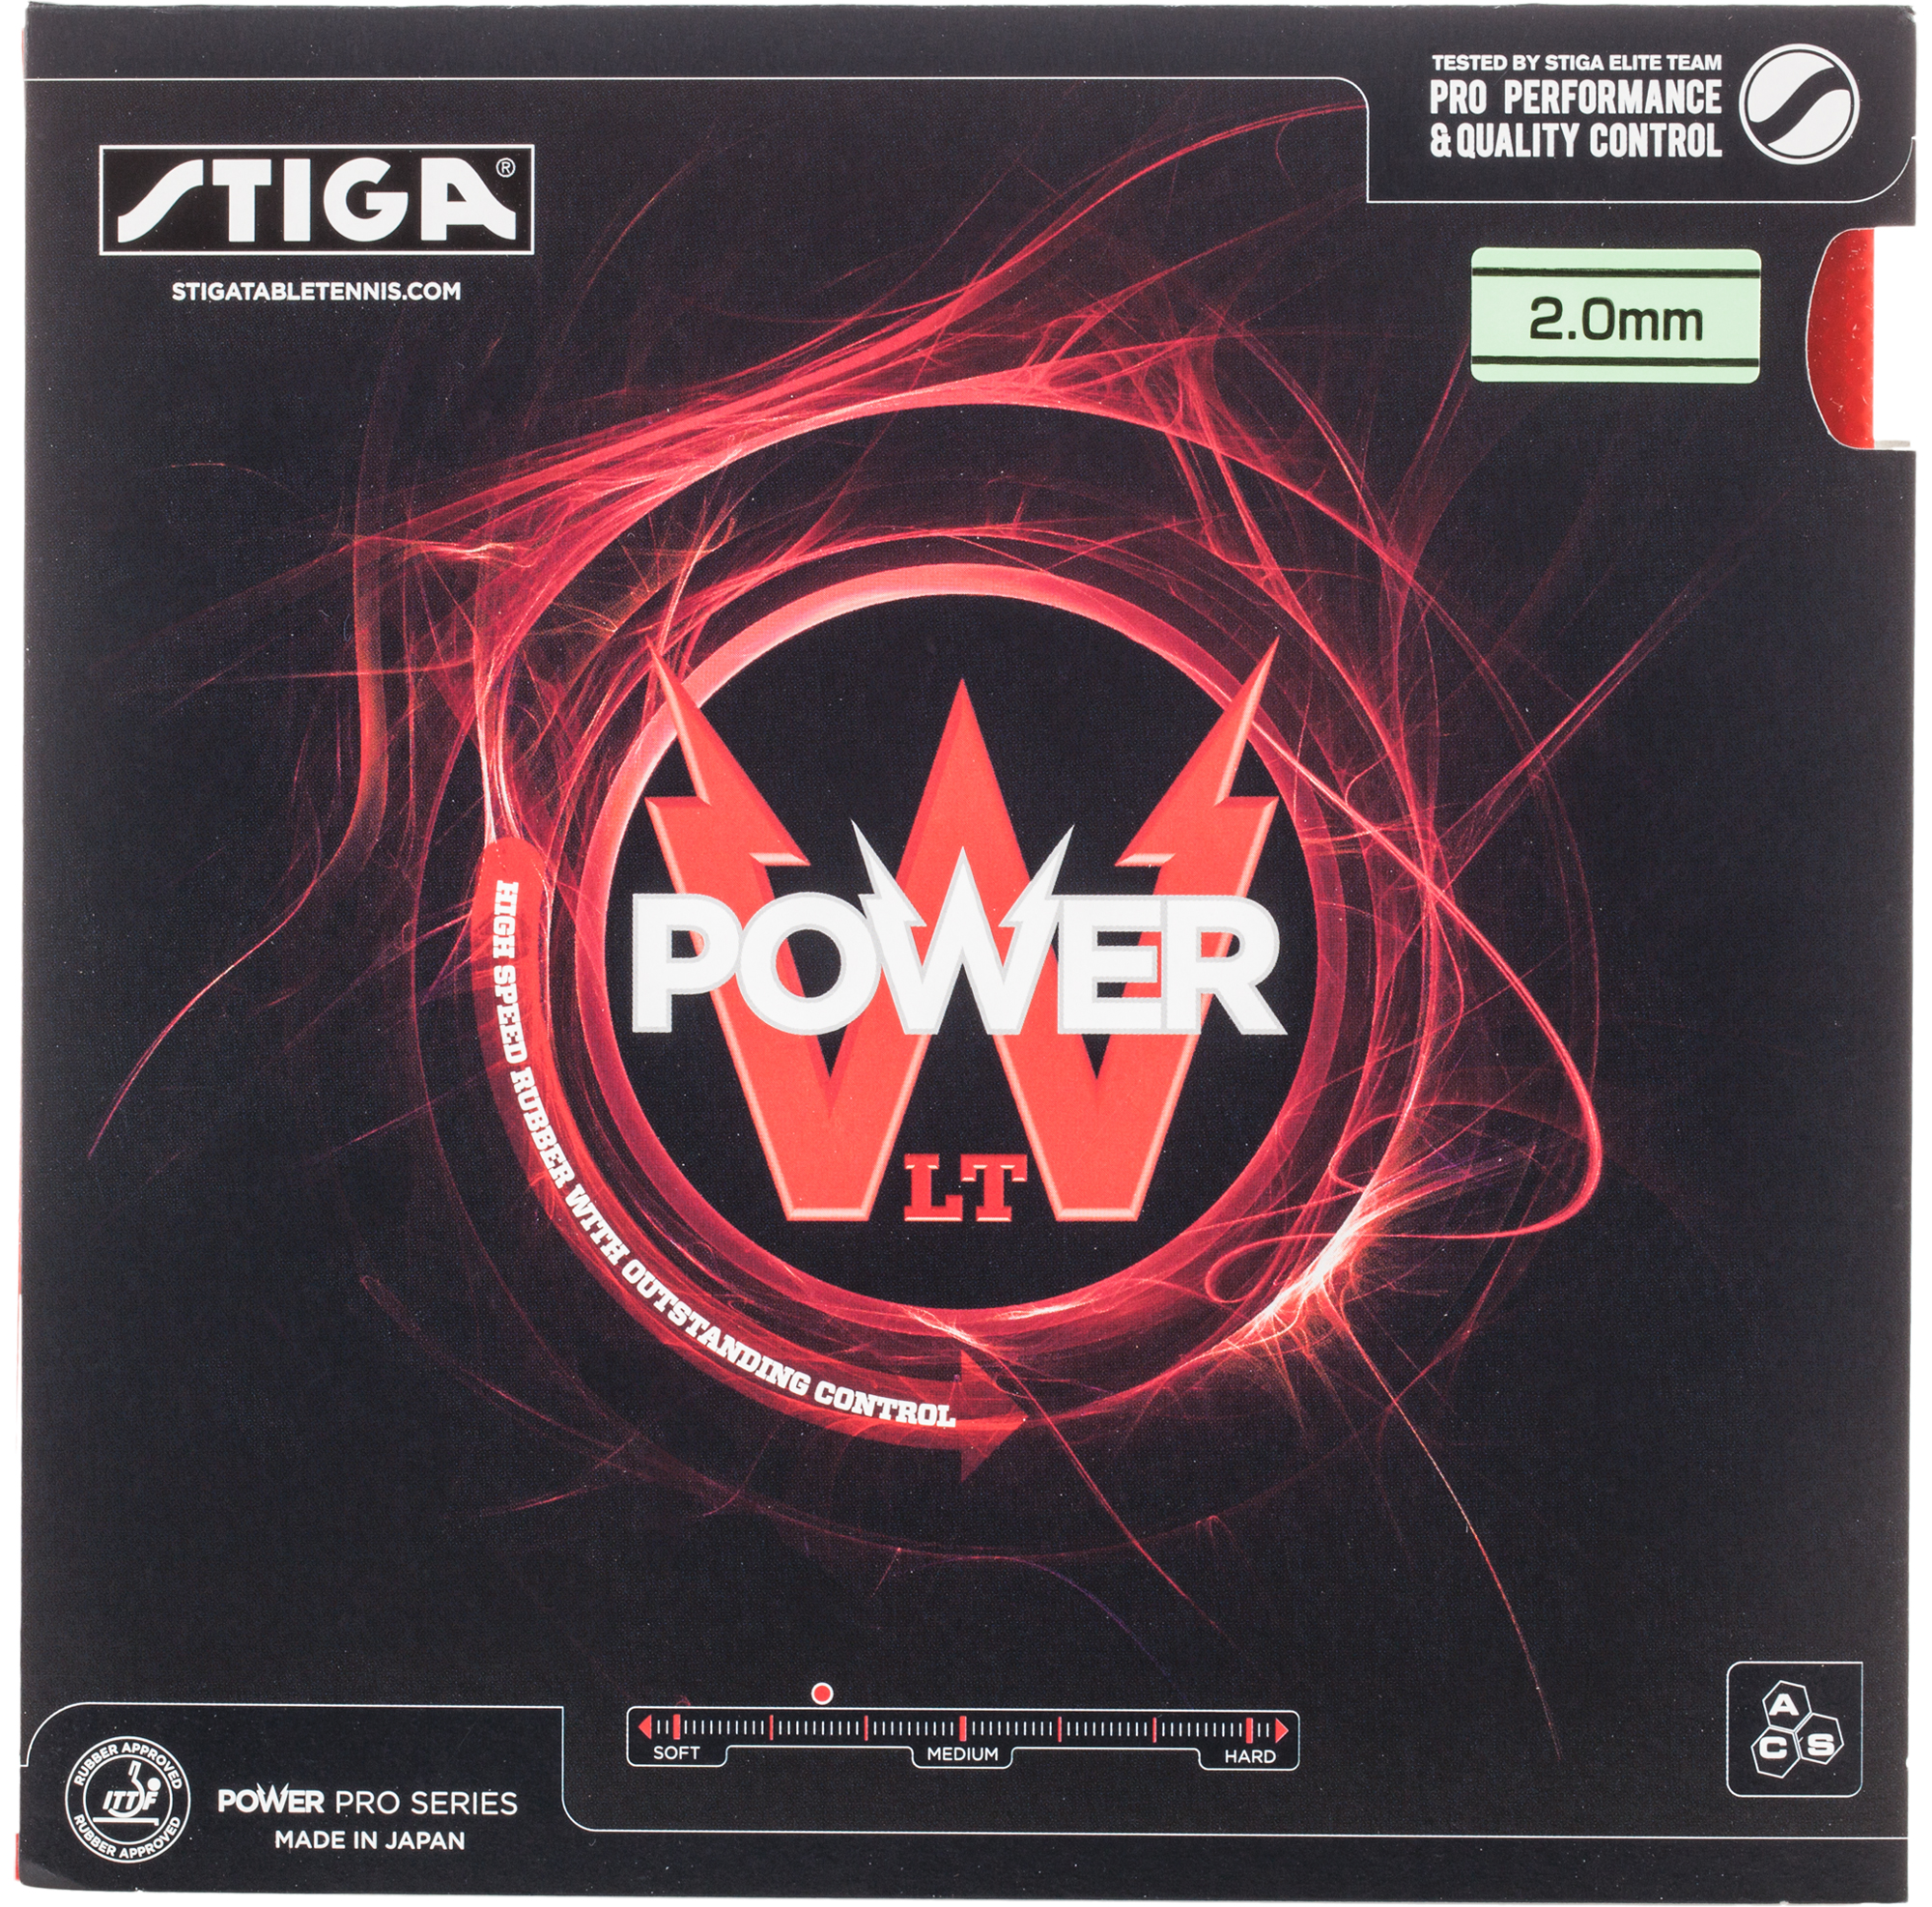 Stiga Накладка для настольного тенниса Stiga Power LT